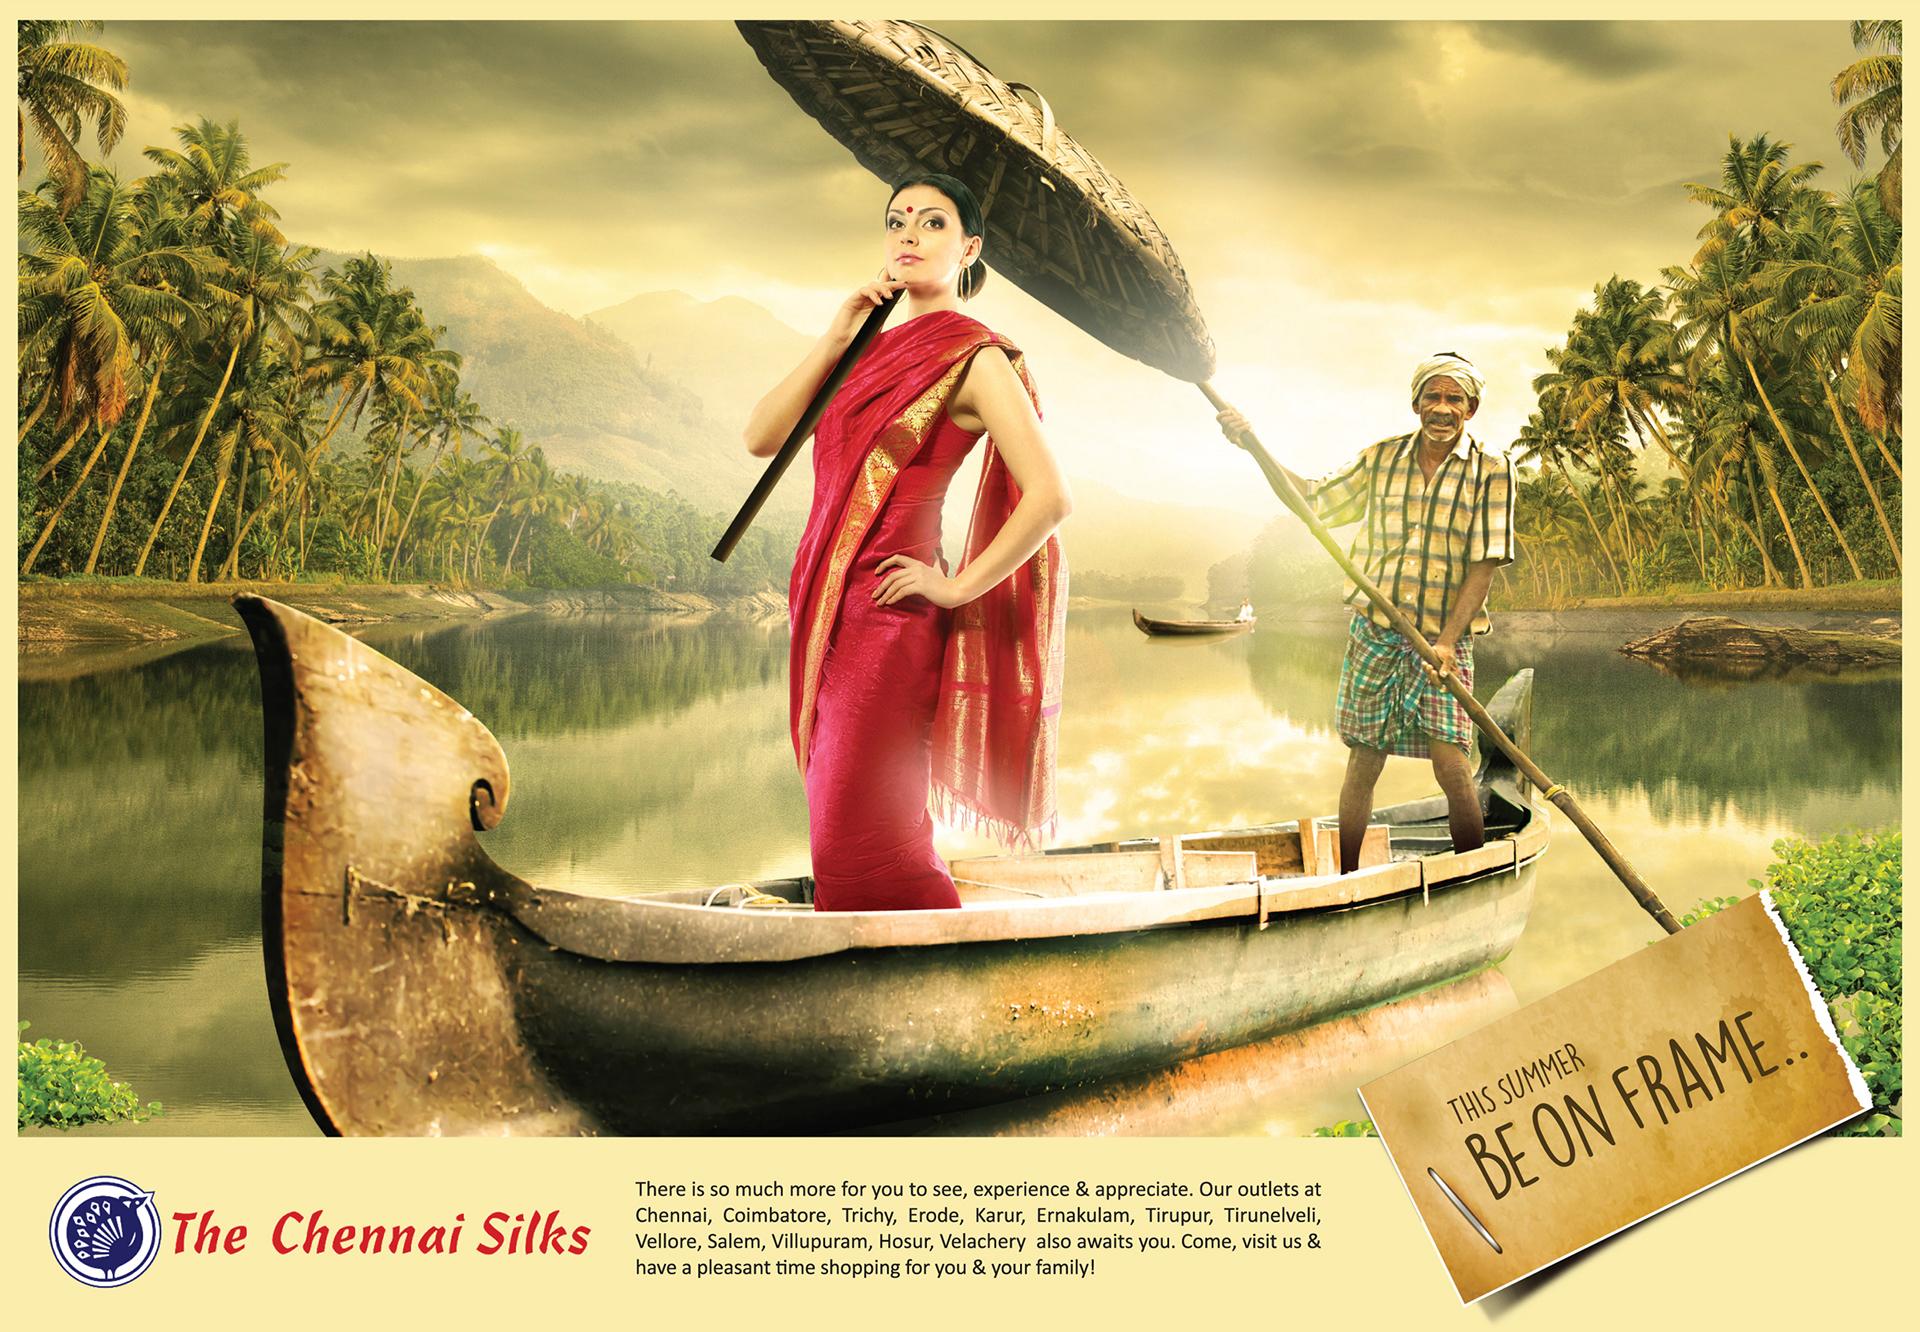 Chennai Silks Kerala Presentation Campaign on Behance